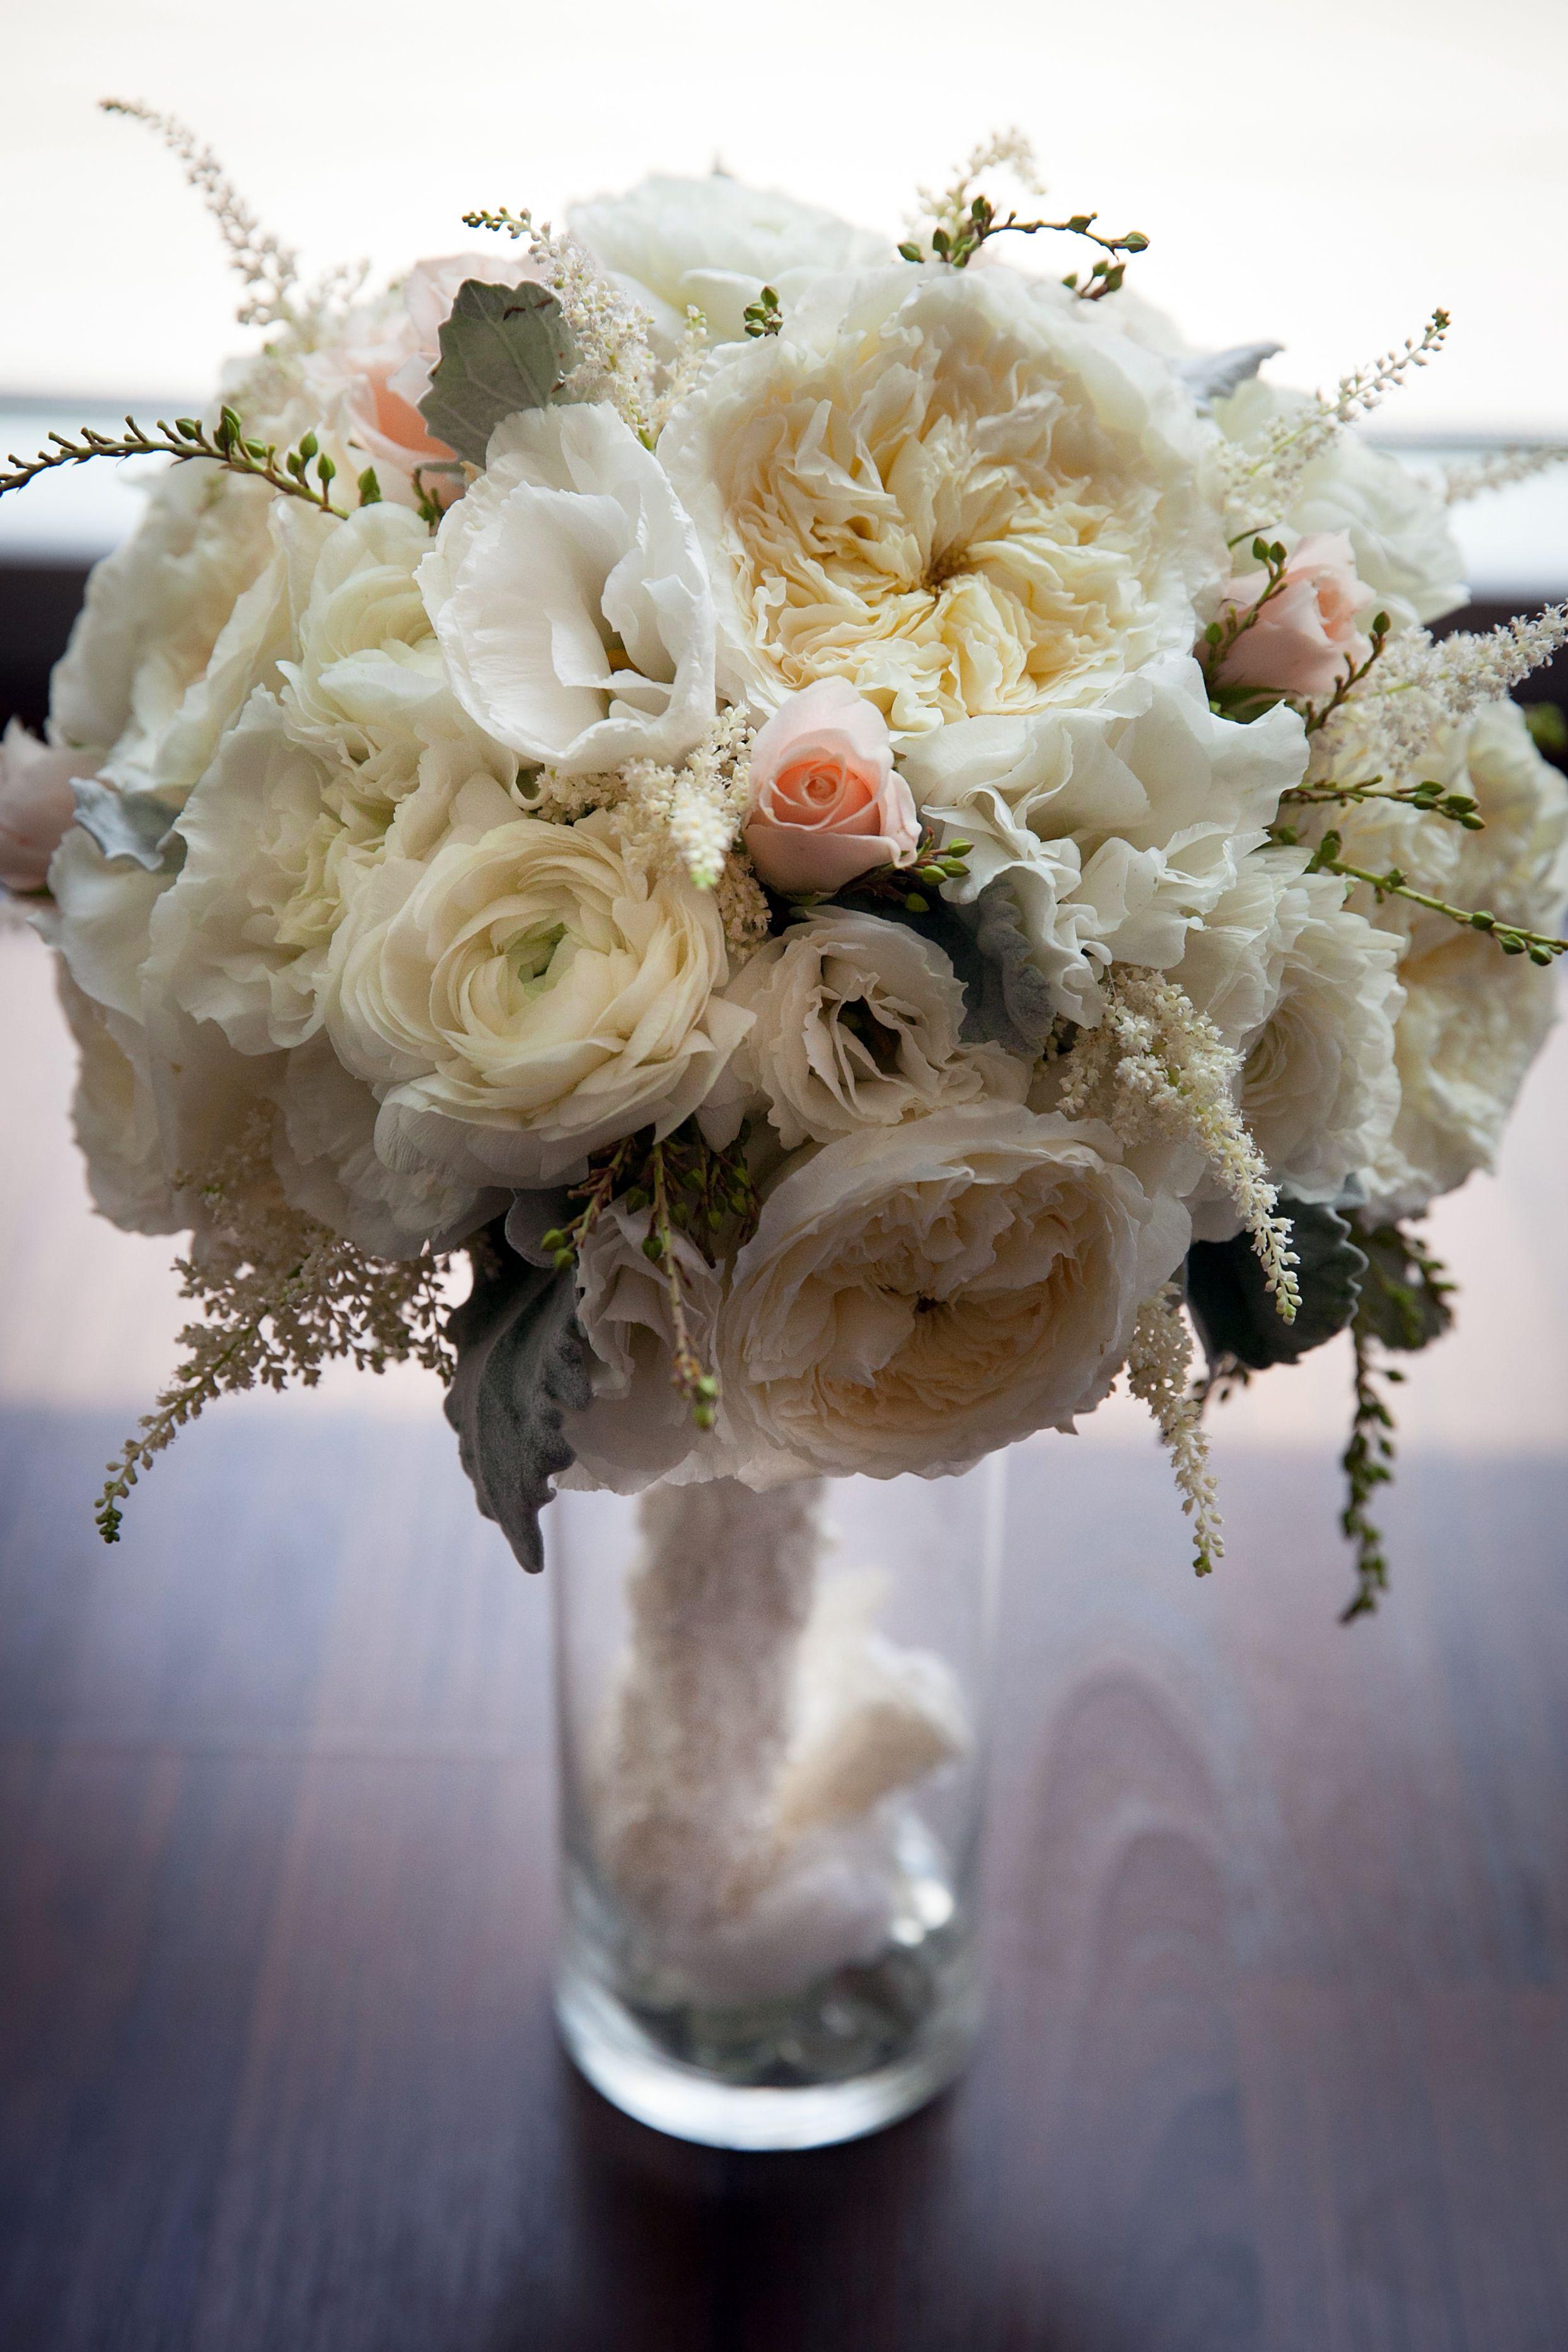 Four Seasons Flowers - Deb Shields Photography